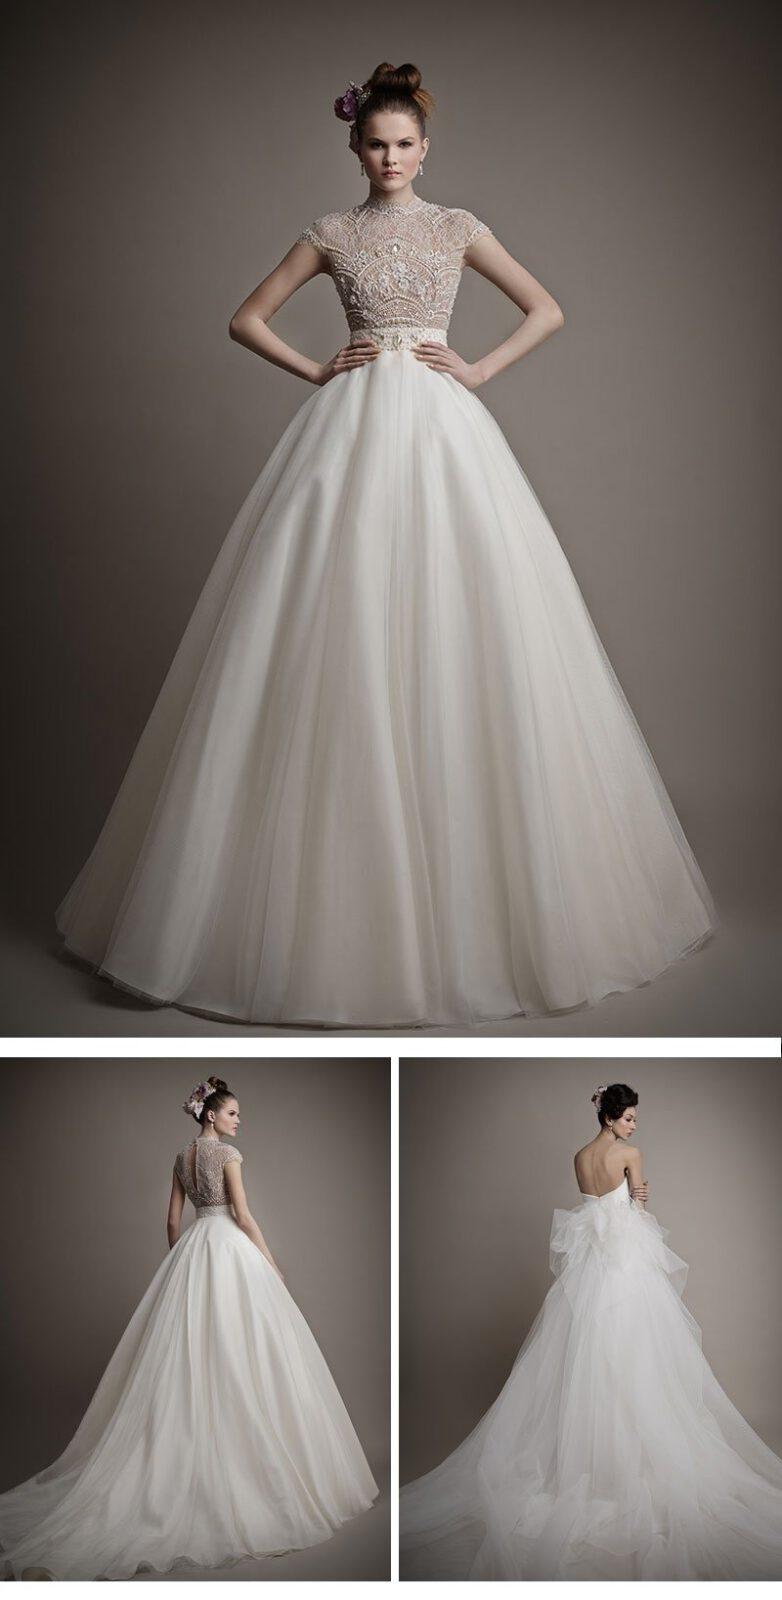 Glamouröse Ersa Atelier Brautkleider Kollektion 2015